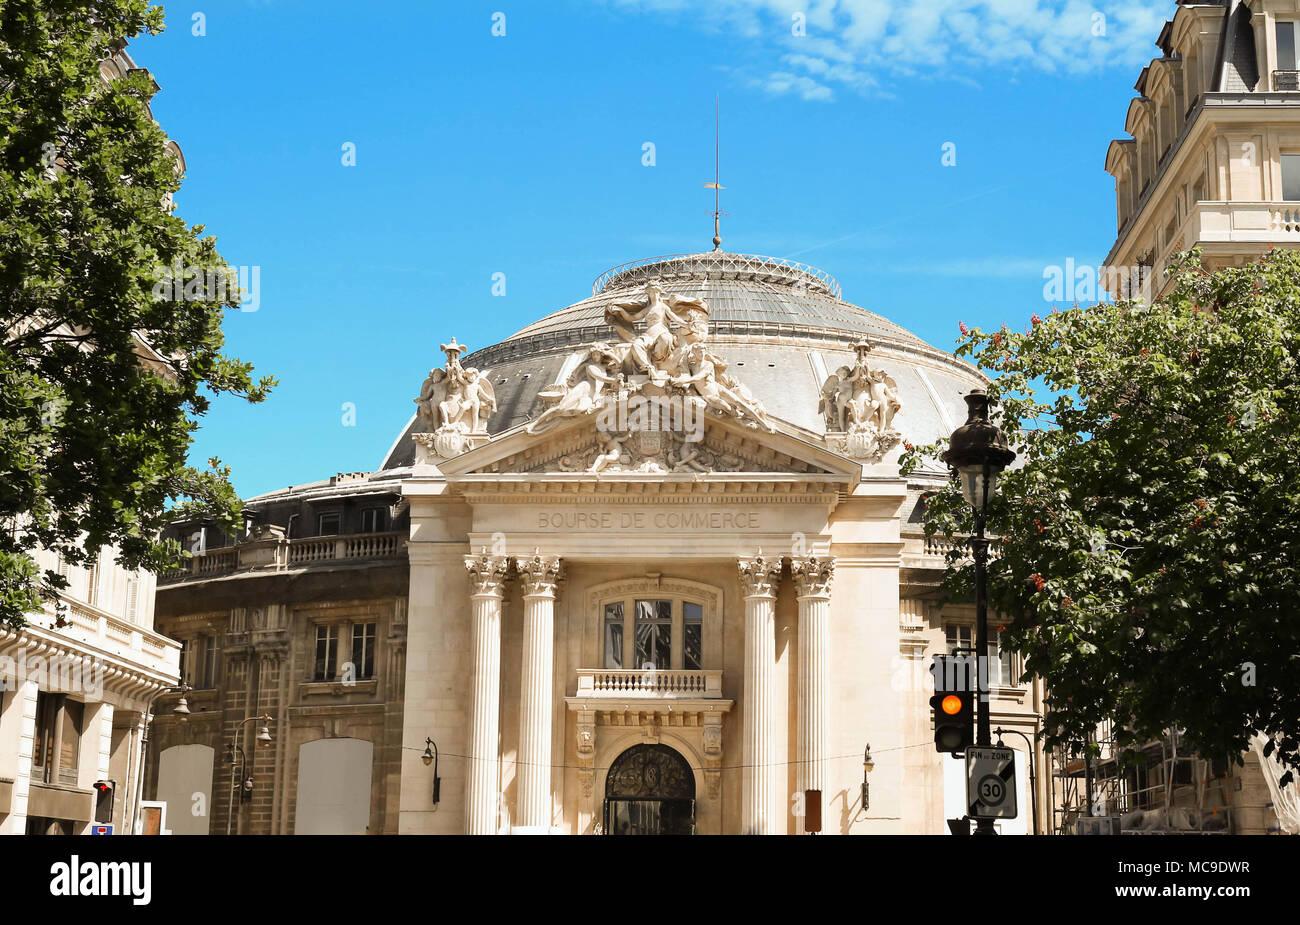 The Front facade of Bourse de Commerce Commodities Exchange of Paris. - Stock Image